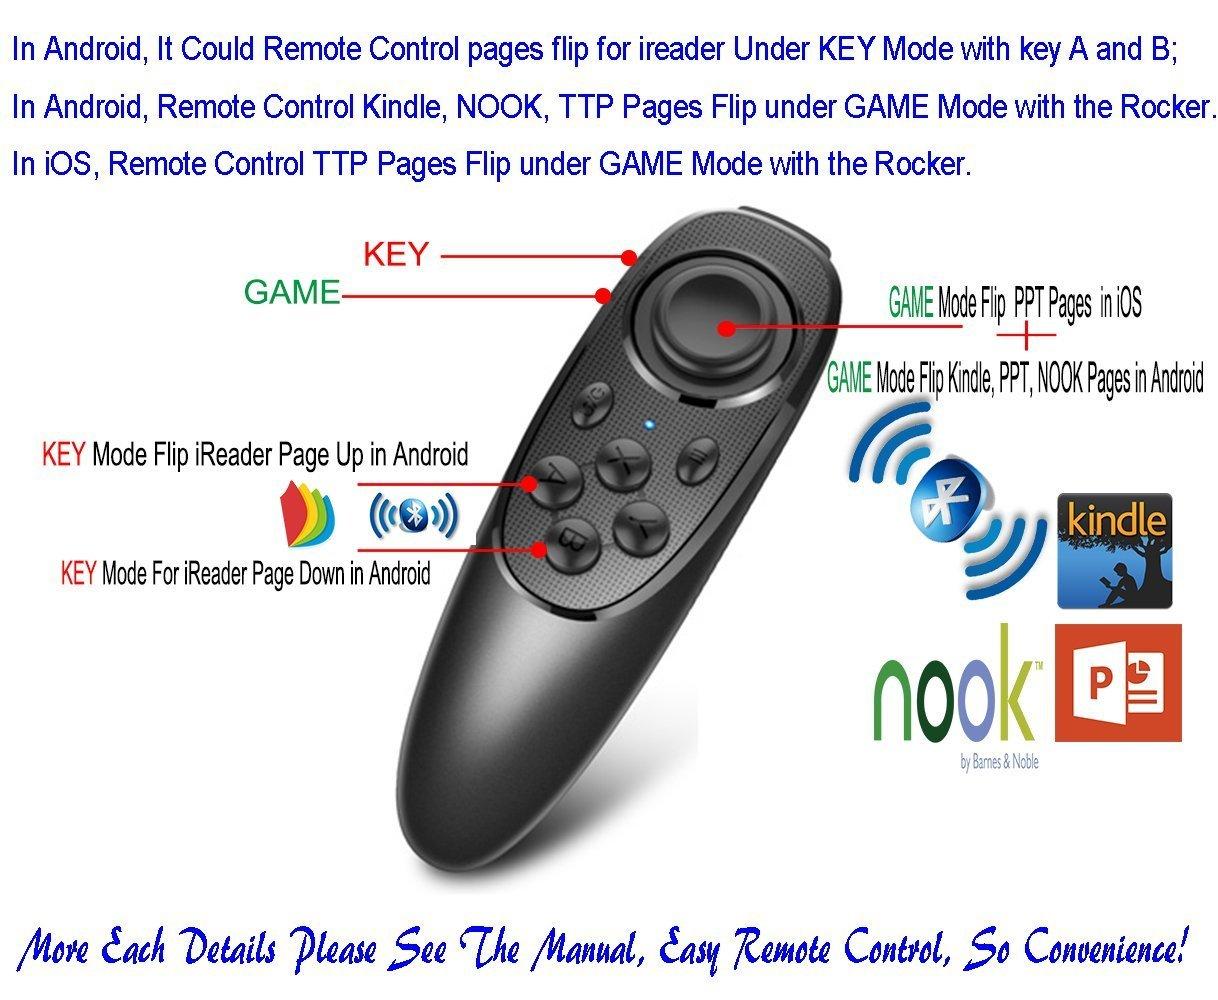 Amazon.com: Universal Gamepad remoto inalámbrico con 2 ...